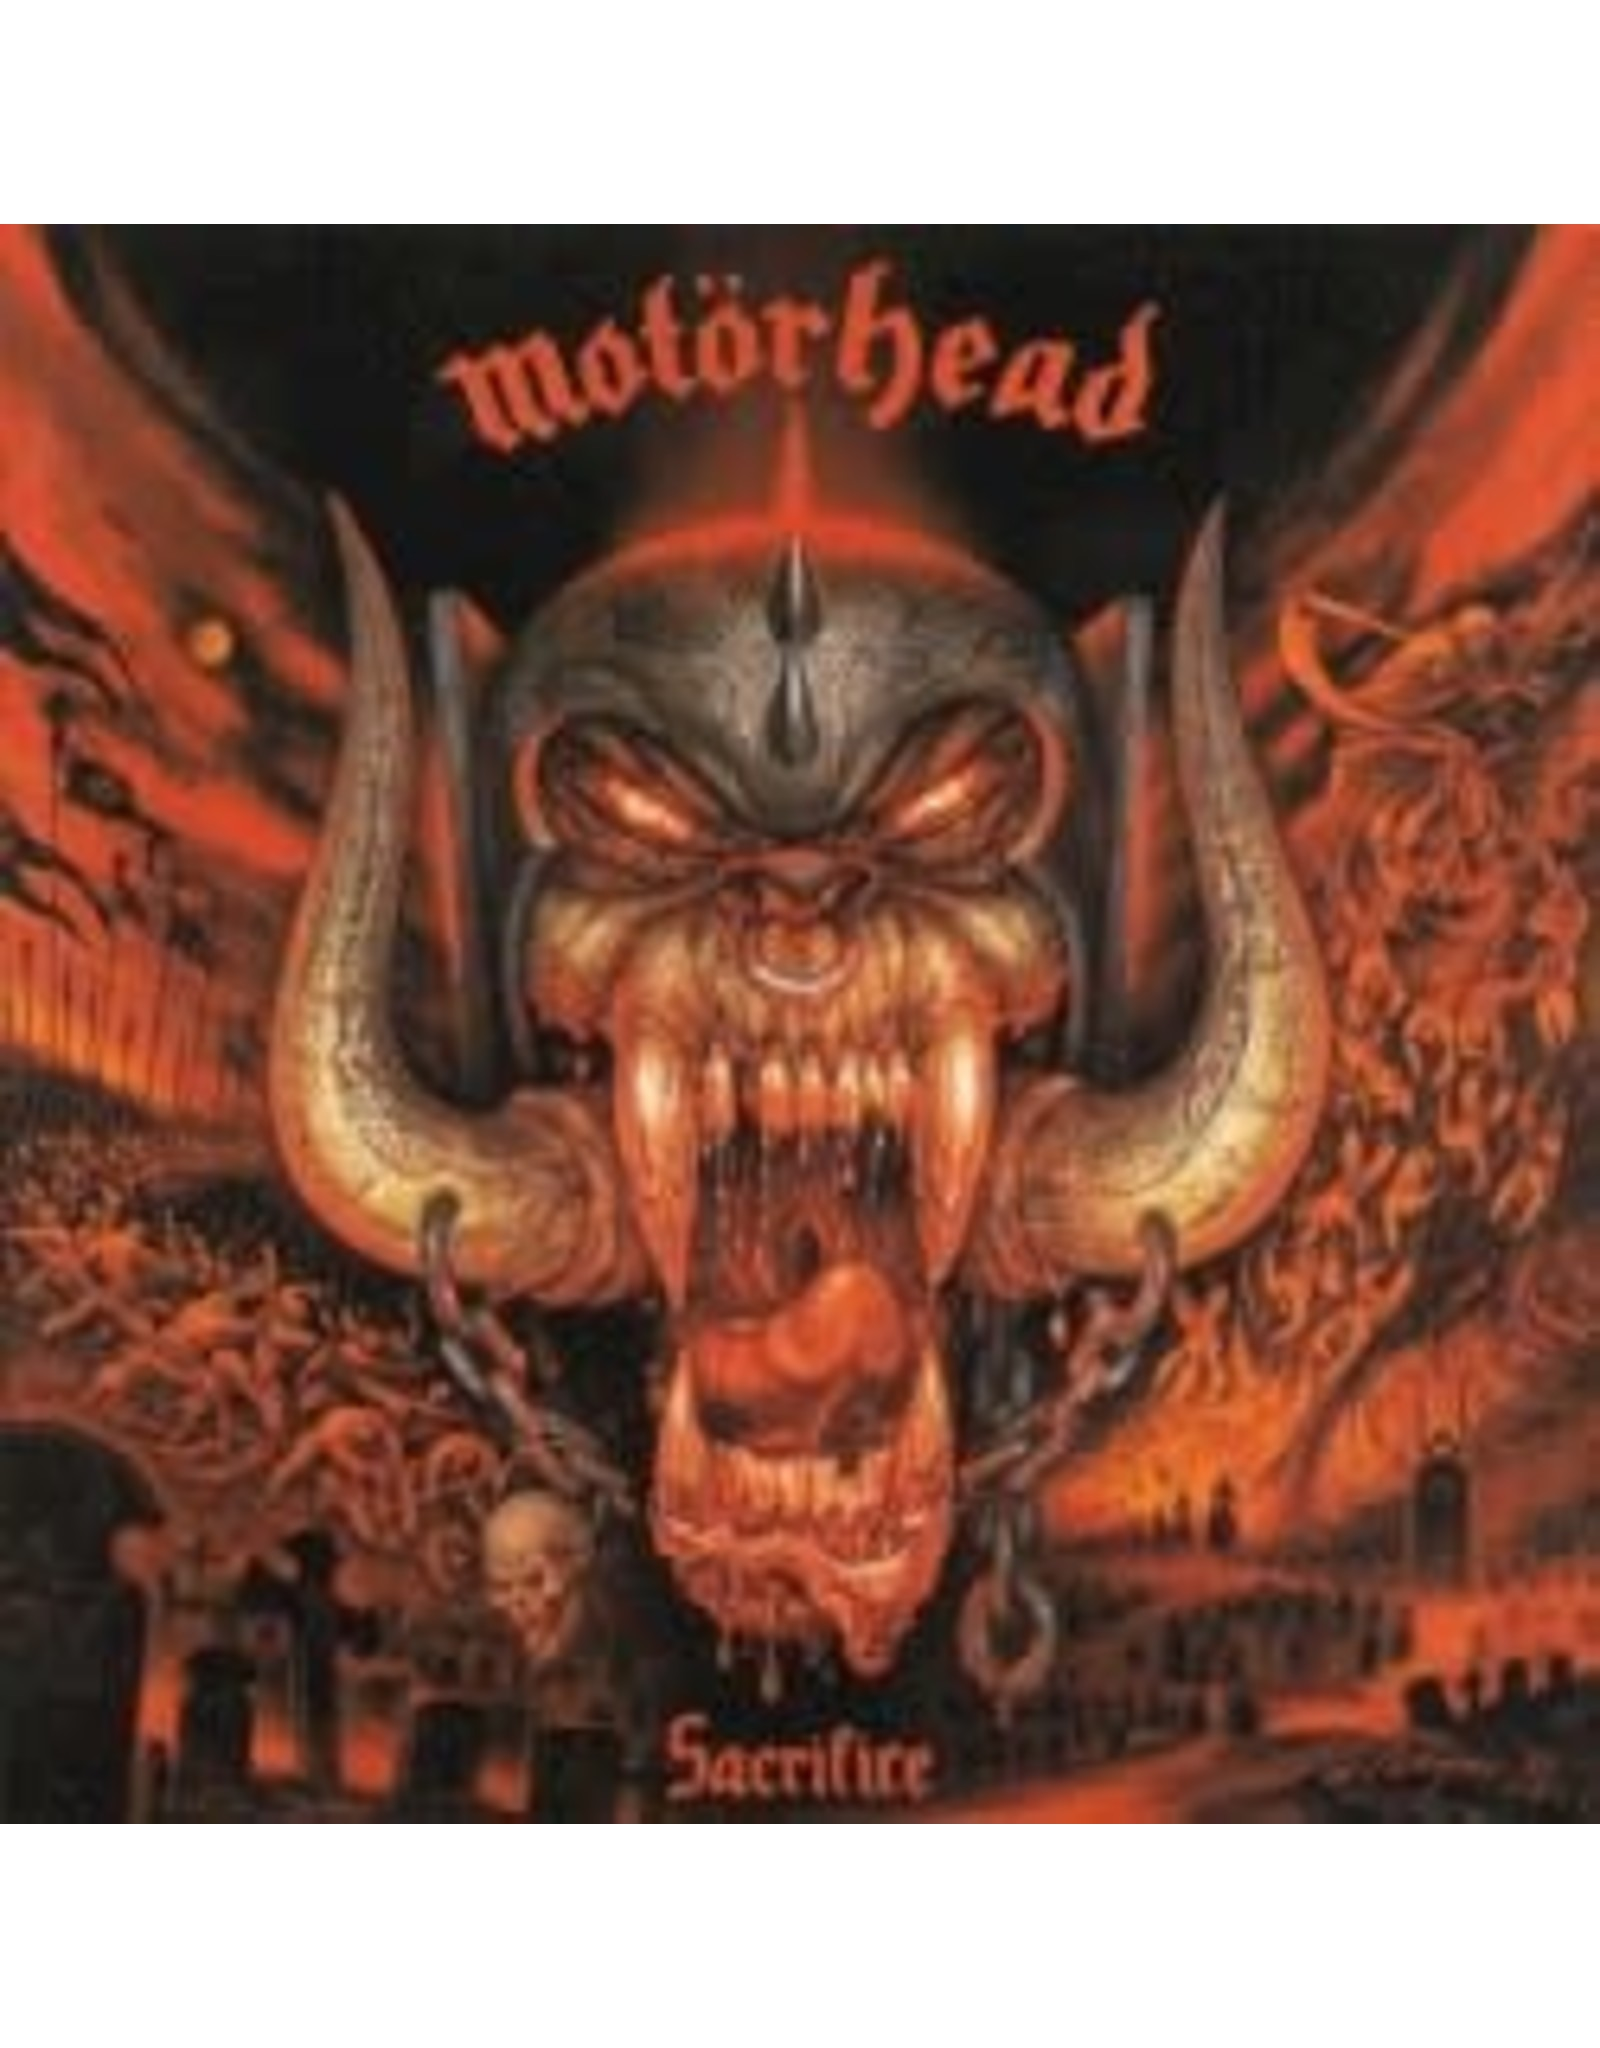 Motorhead - Sacrifice LP